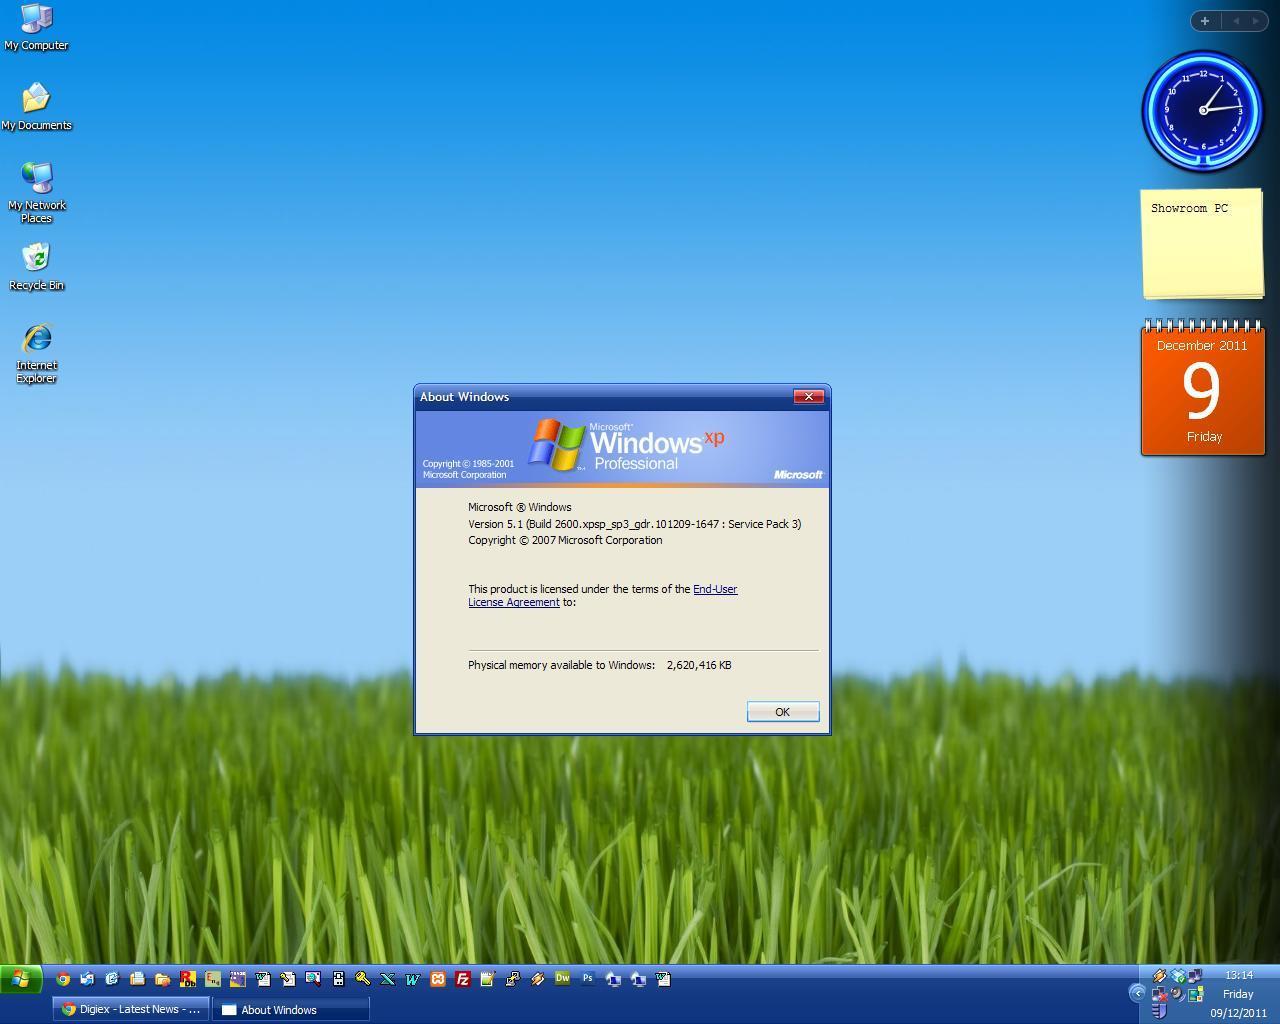 Windows 8 start screen full 3. 0 free download software reviews.